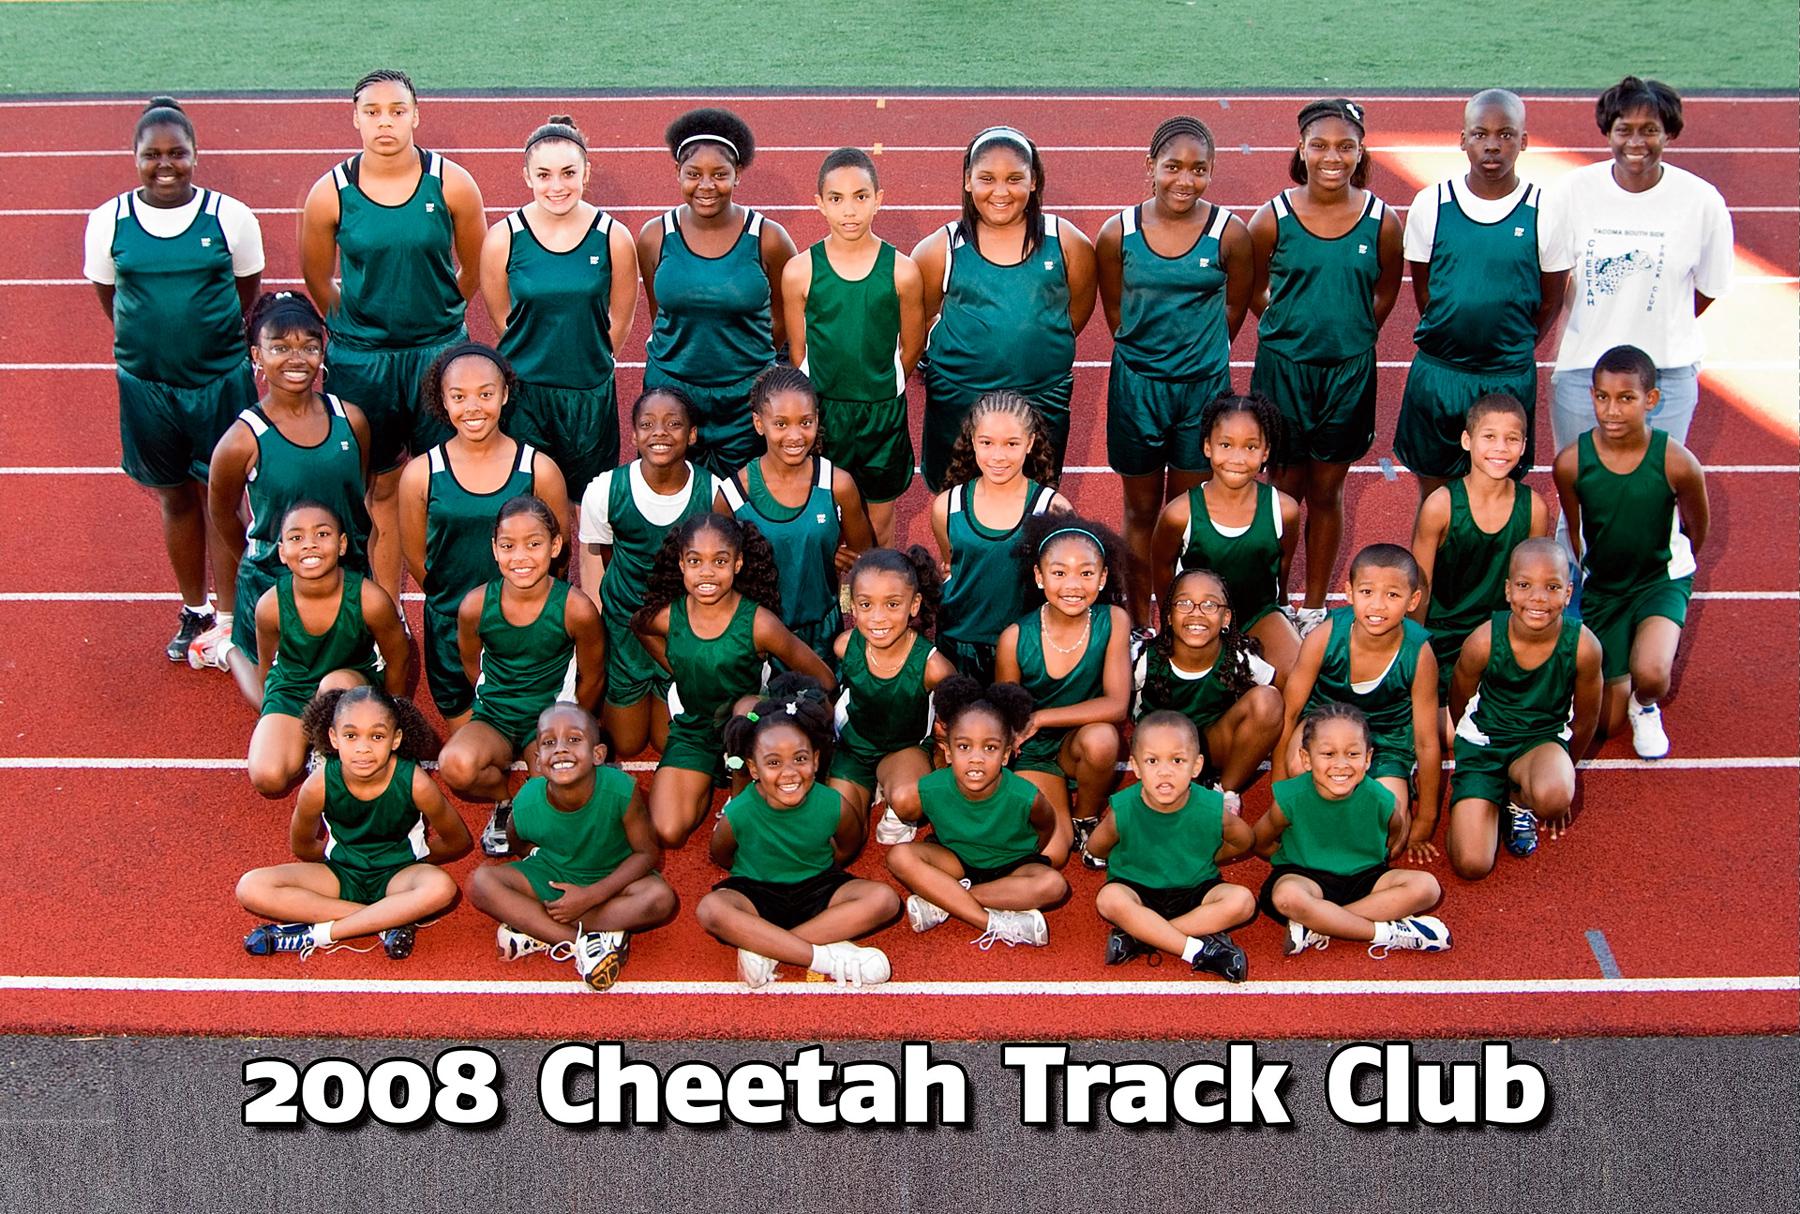 2008 Team Photo